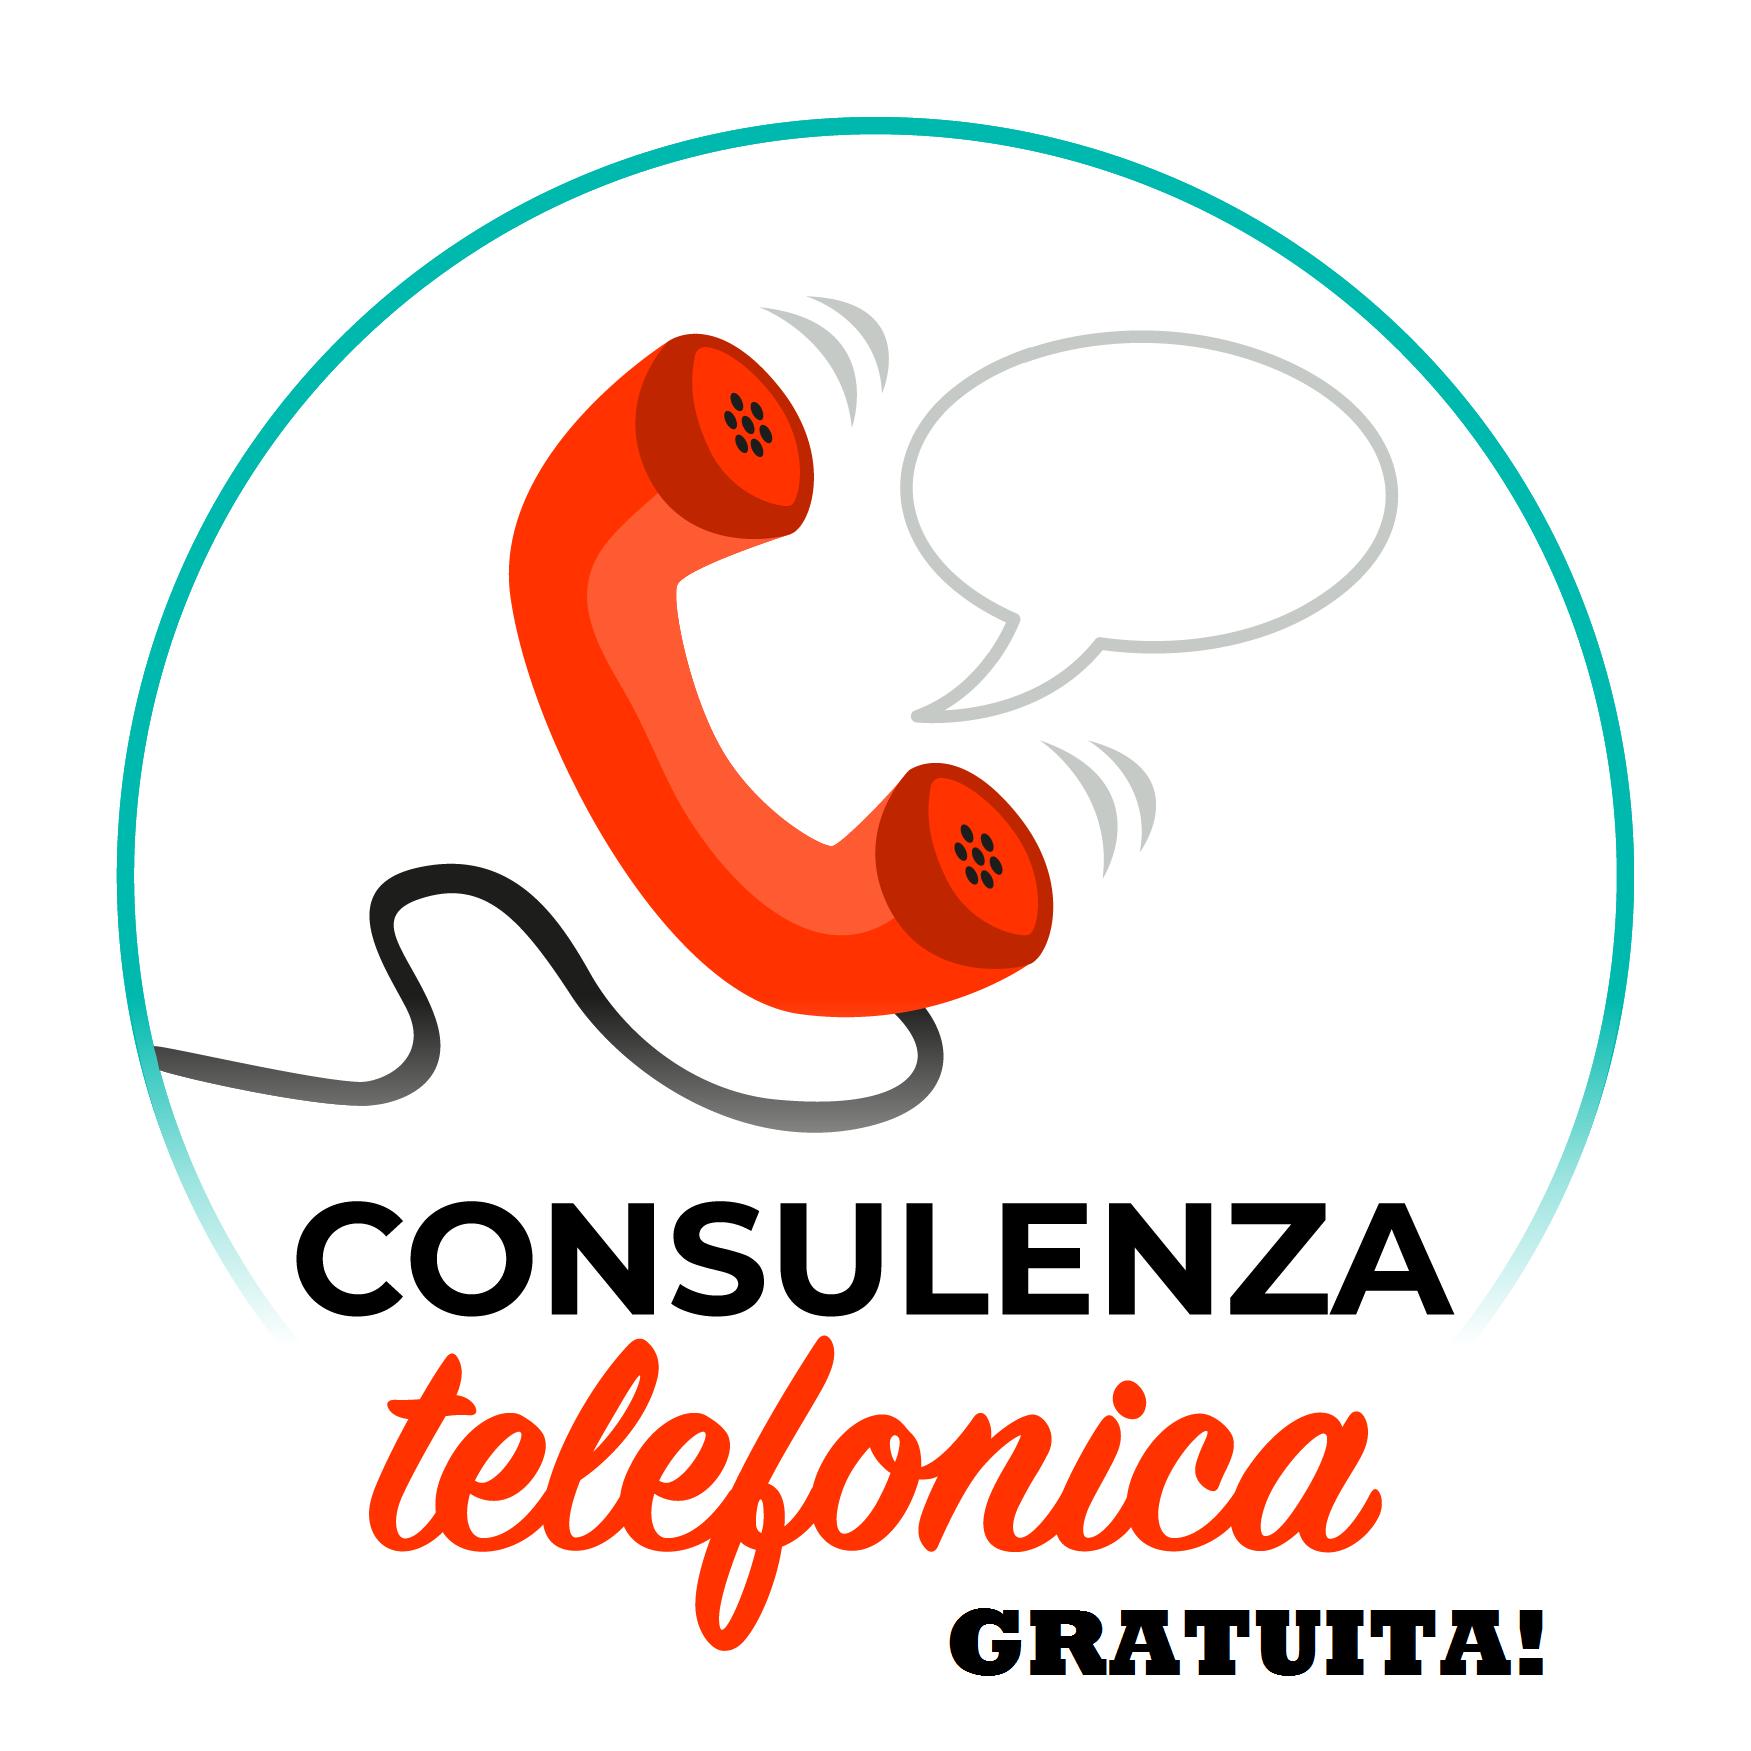 Consulenza Gratuita